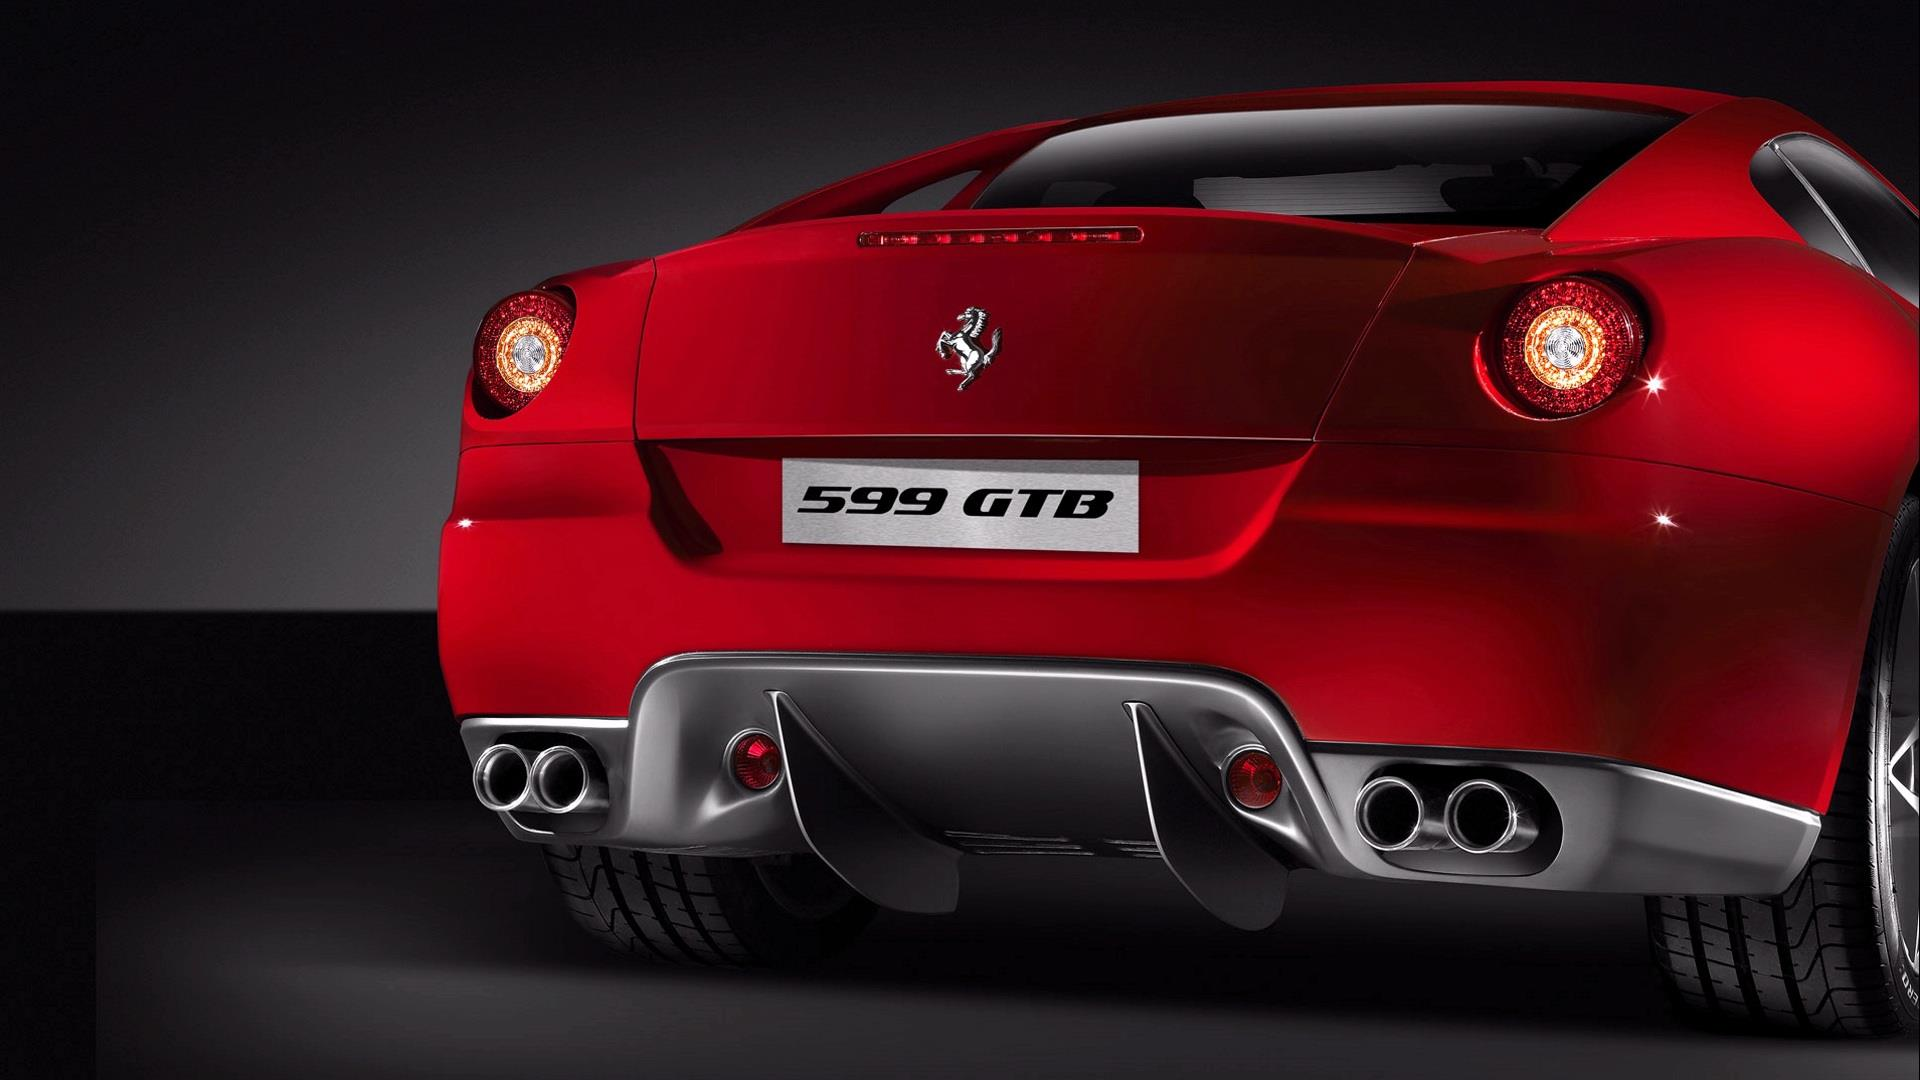 rouge-ferrari-automobile-de-luxe-passion_3